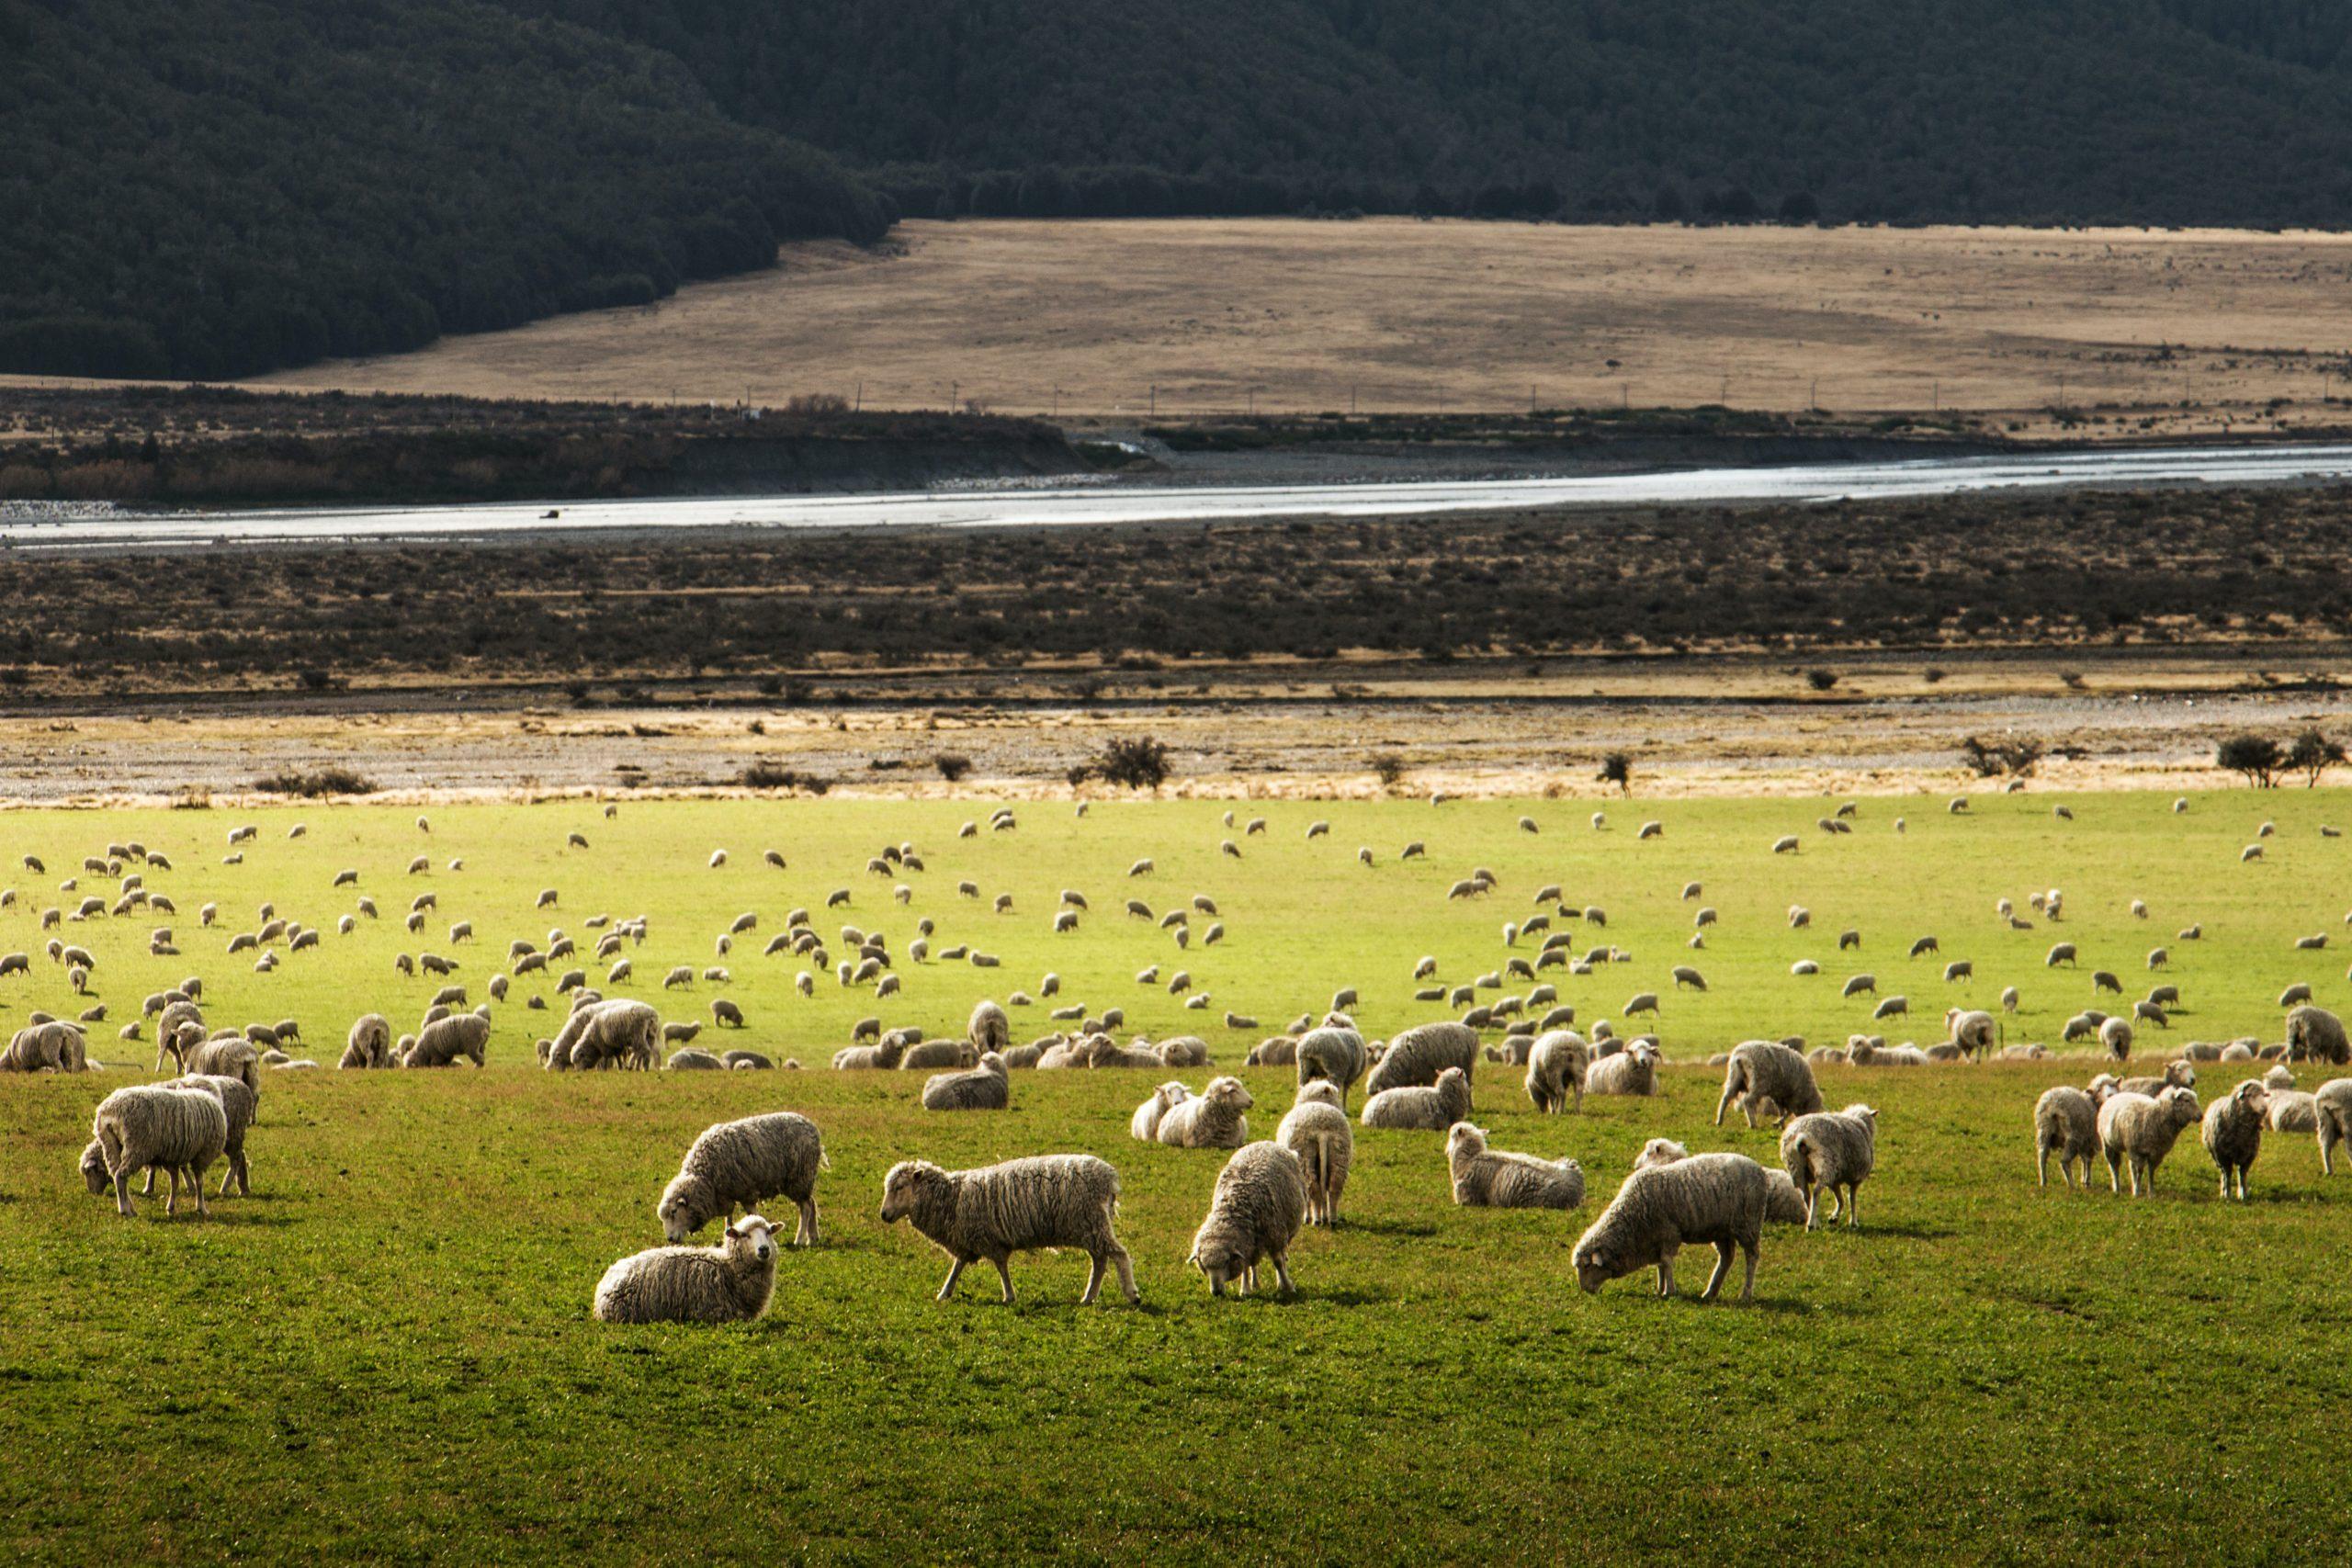 herd of sheep on grass field